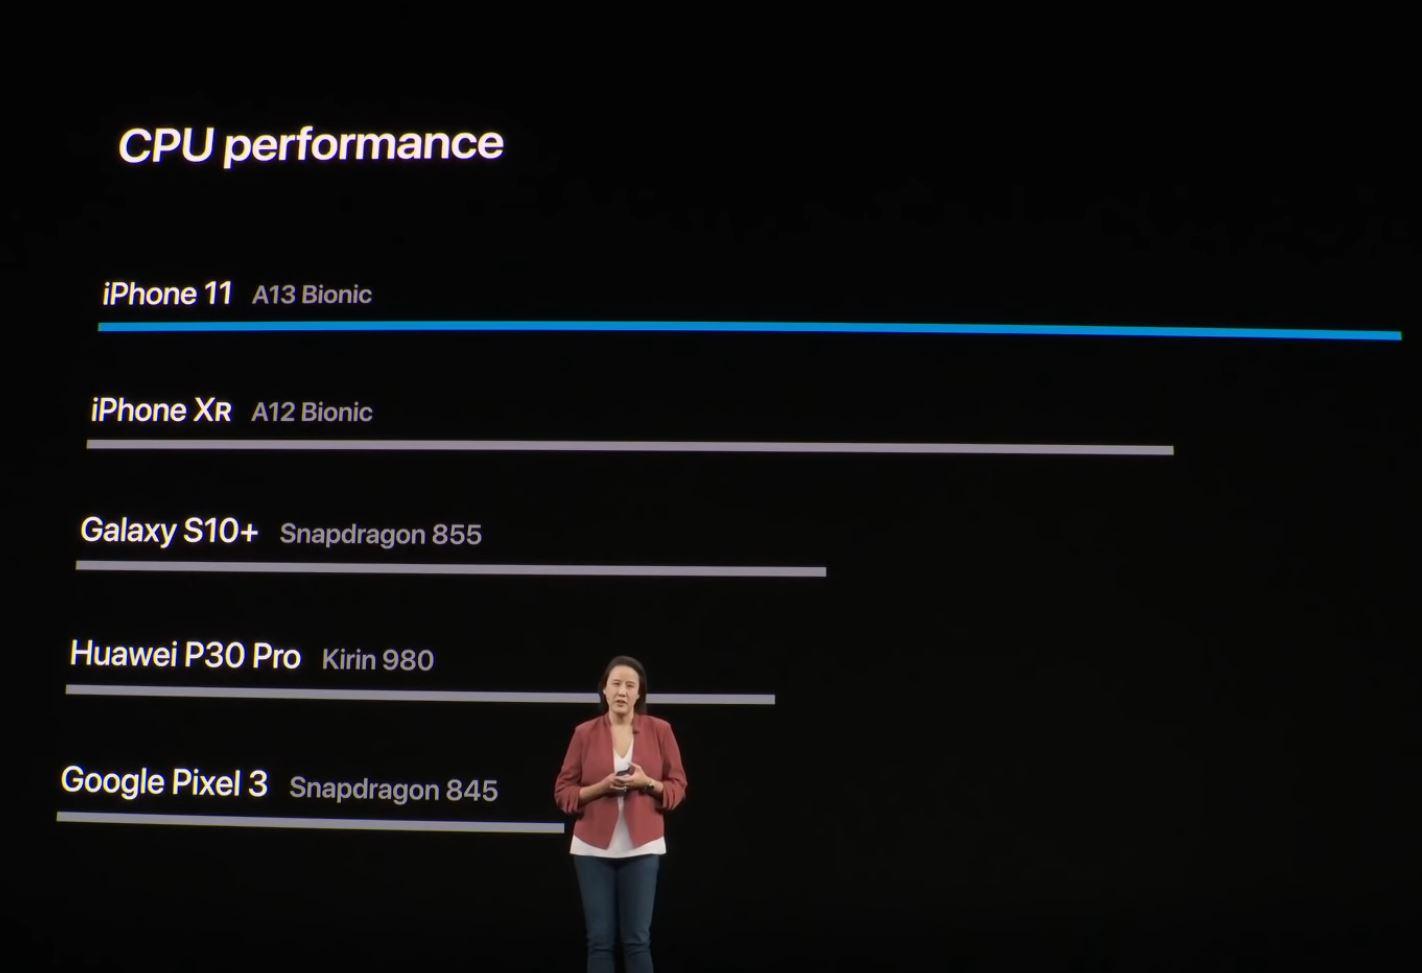 iPhone 11 Cum A RAS Apple de Huawei P30 PRO, GALAXY S10 performante